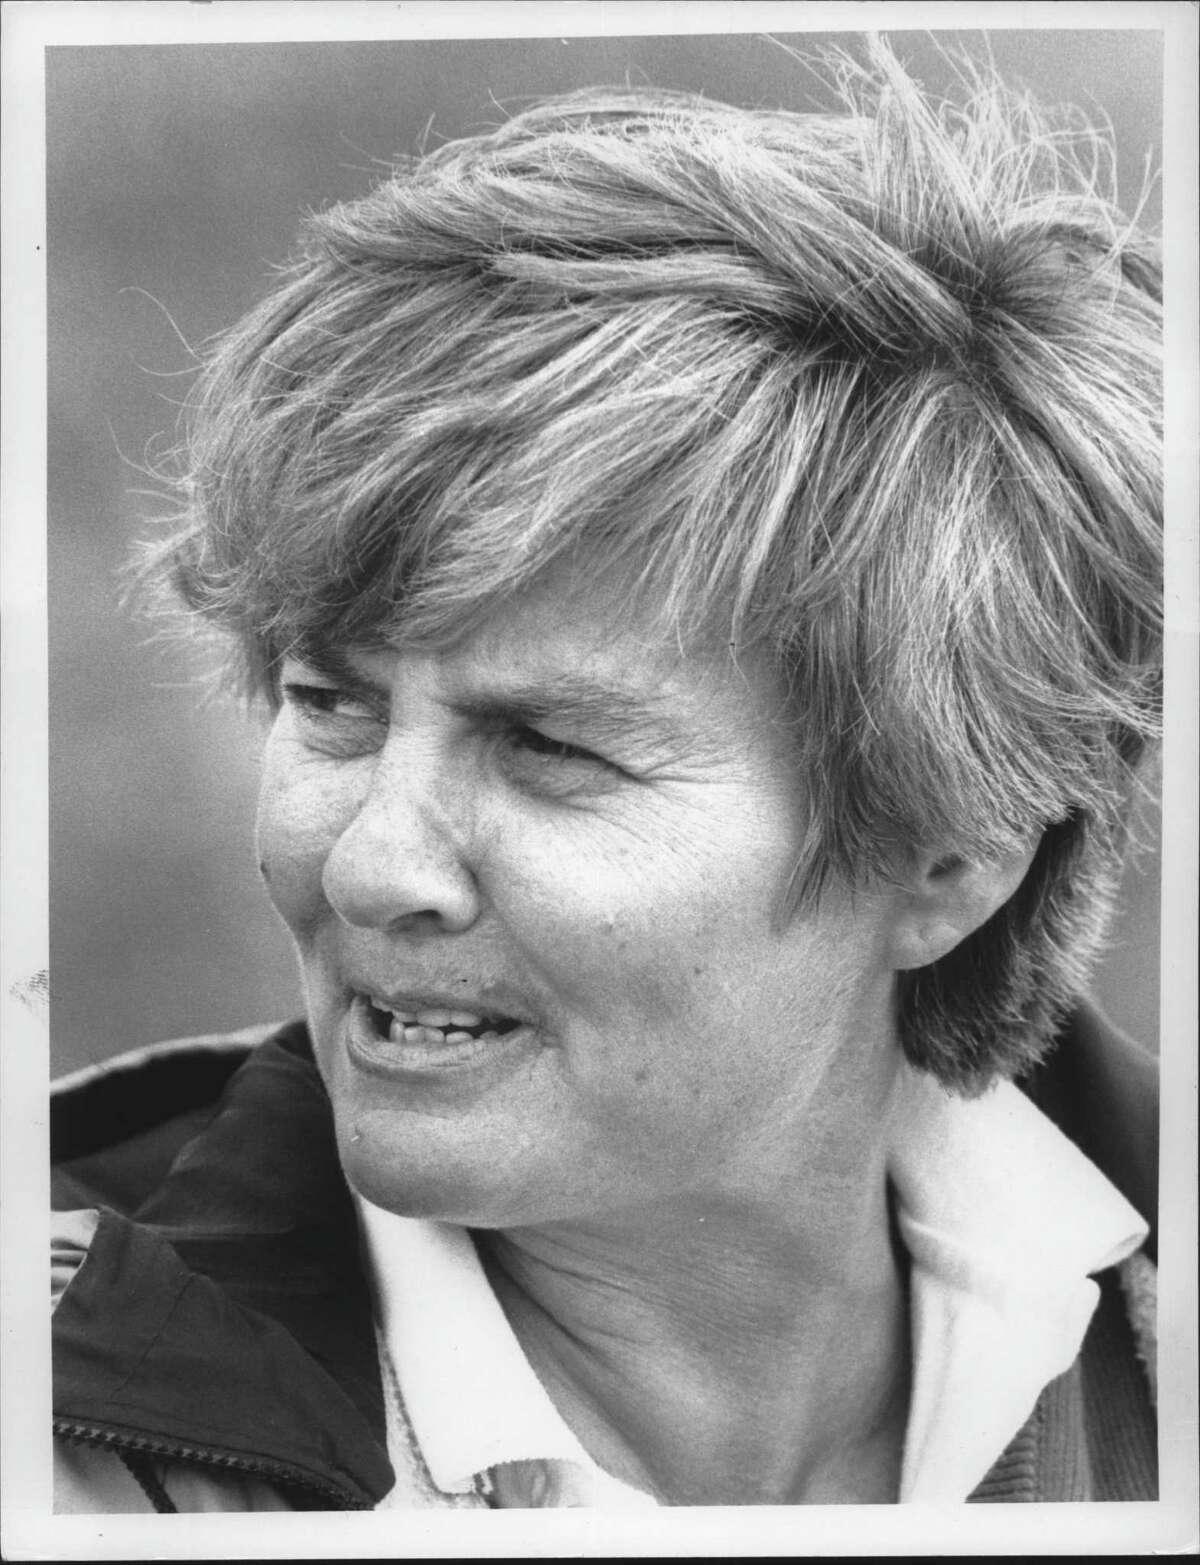 Shenendehowa High School girls' varsity soccer coach Jan Federice, back in 1988.